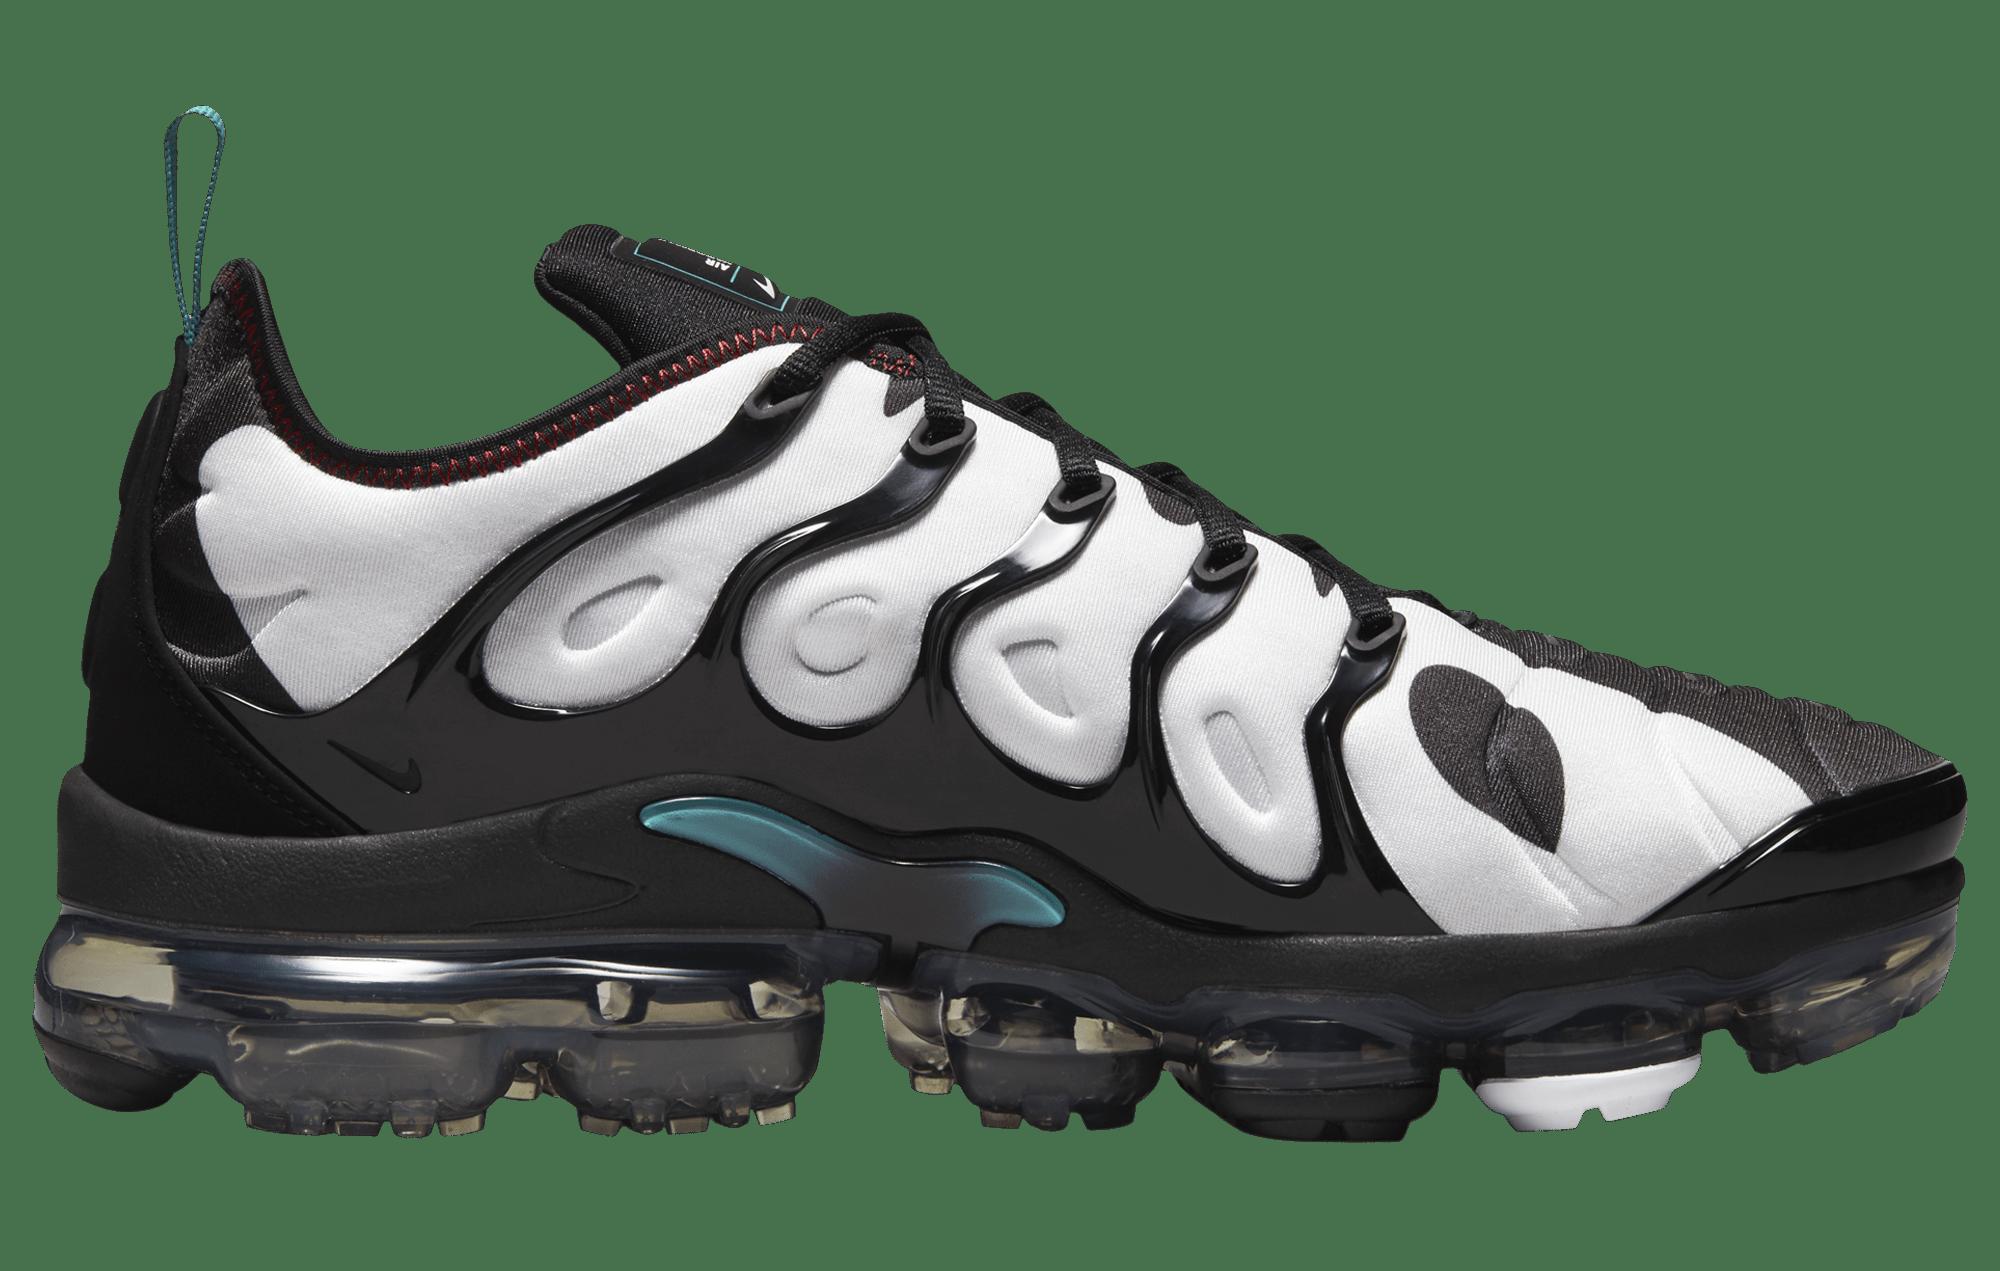 Nike Vapormax Plus 'Webbed Fury' CD5189-001 Lateral